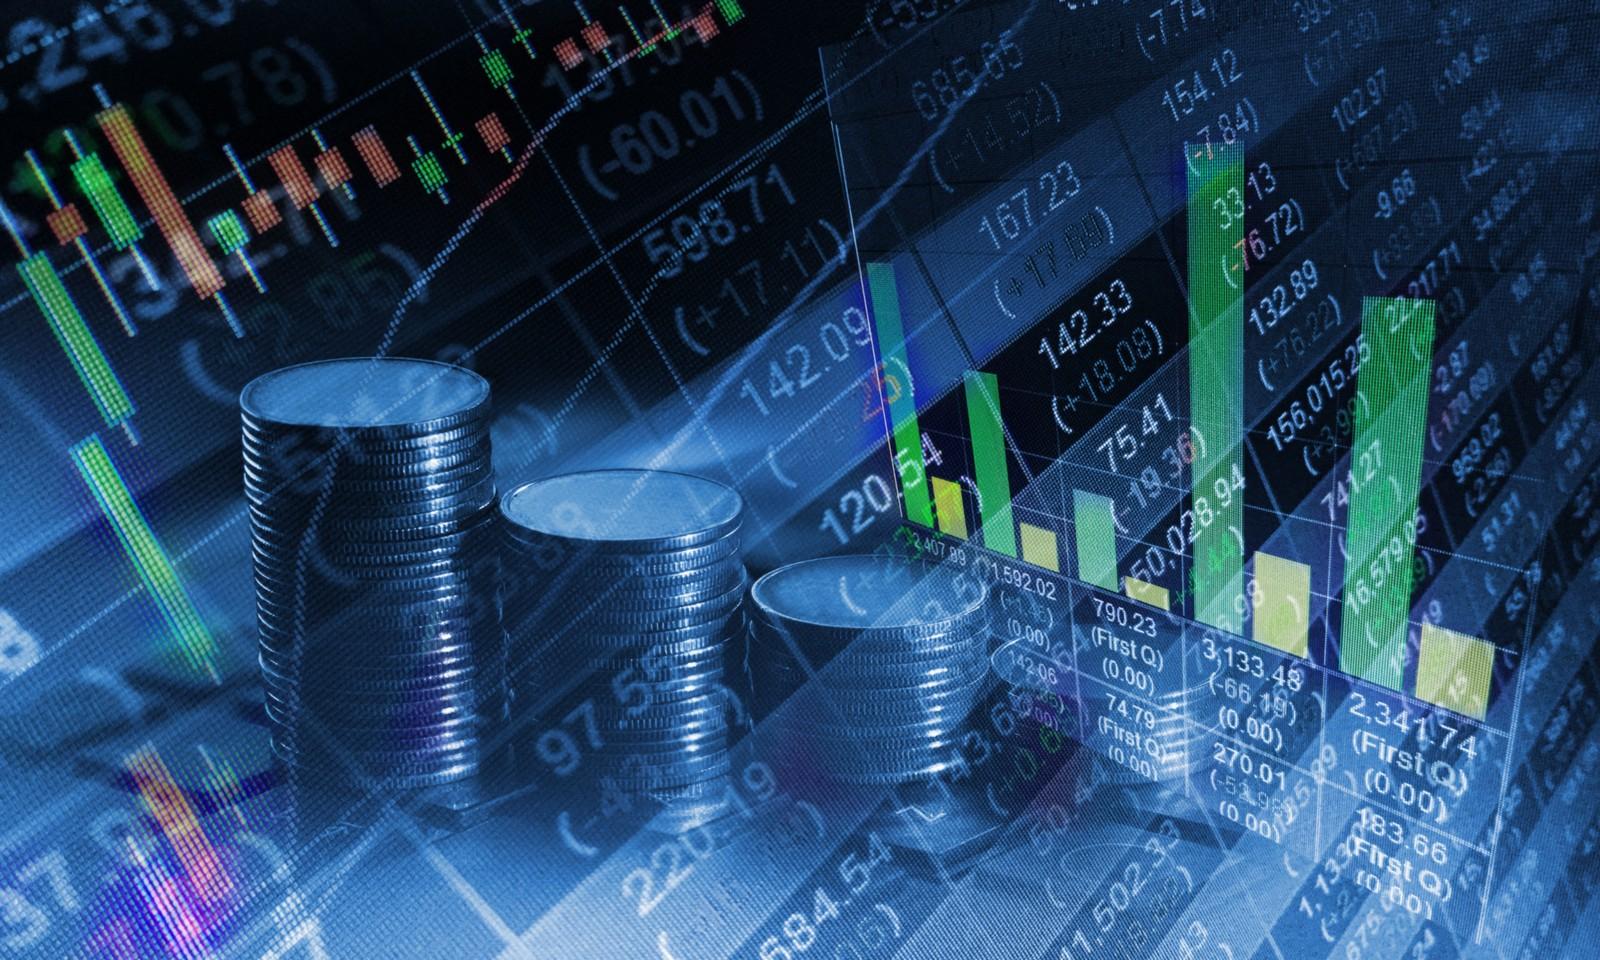 O preço do Bitcoin vai continuar subindo? Confira análise